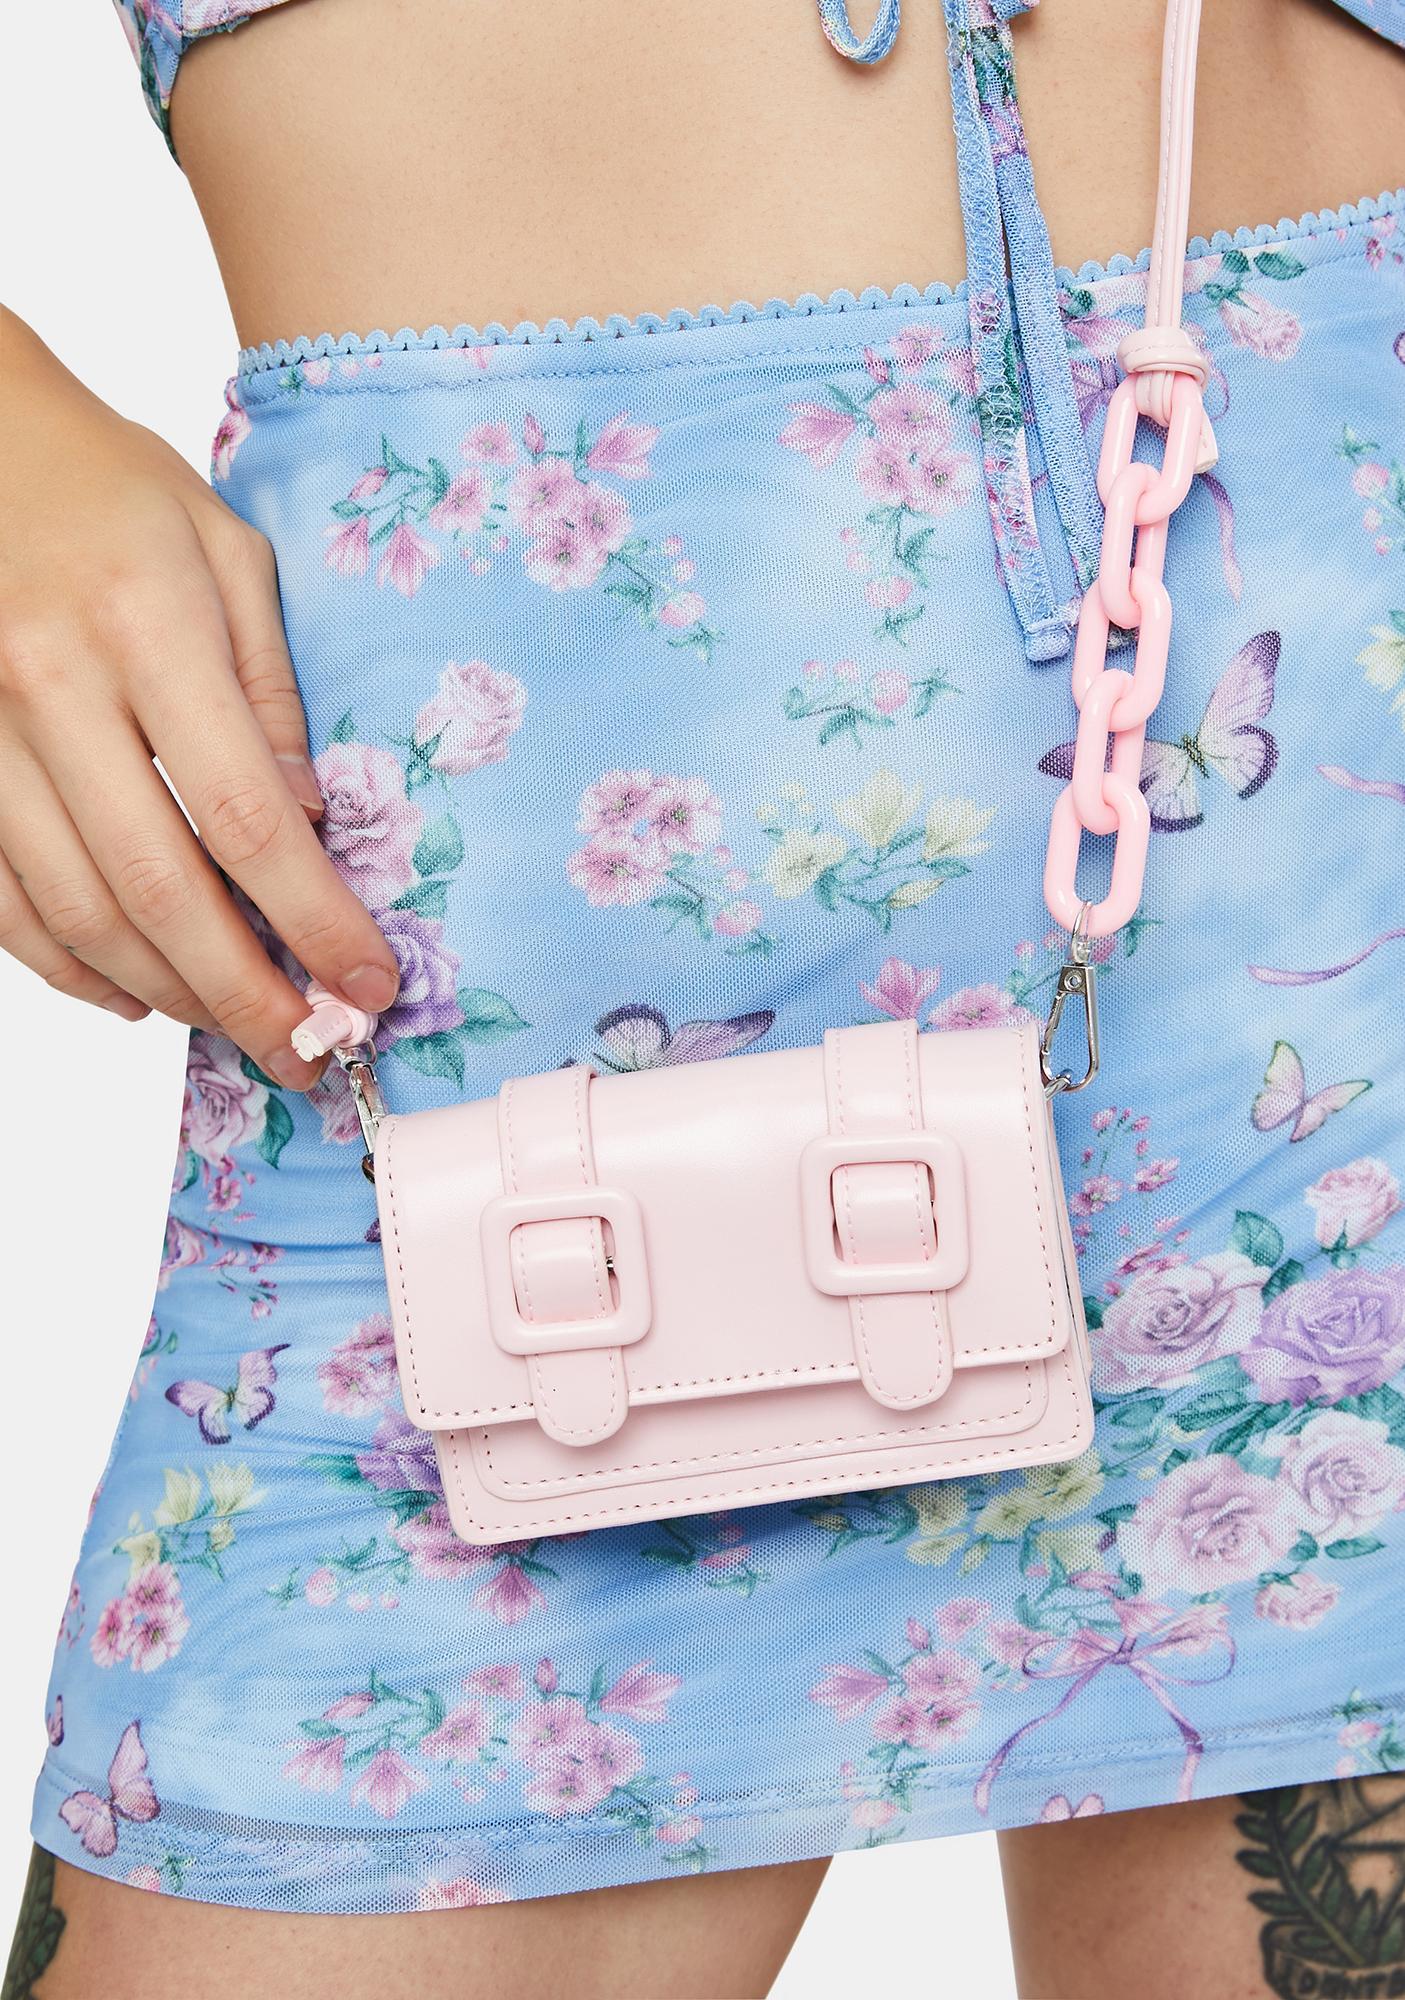 Sweet My Mini Me Crossbody Bag